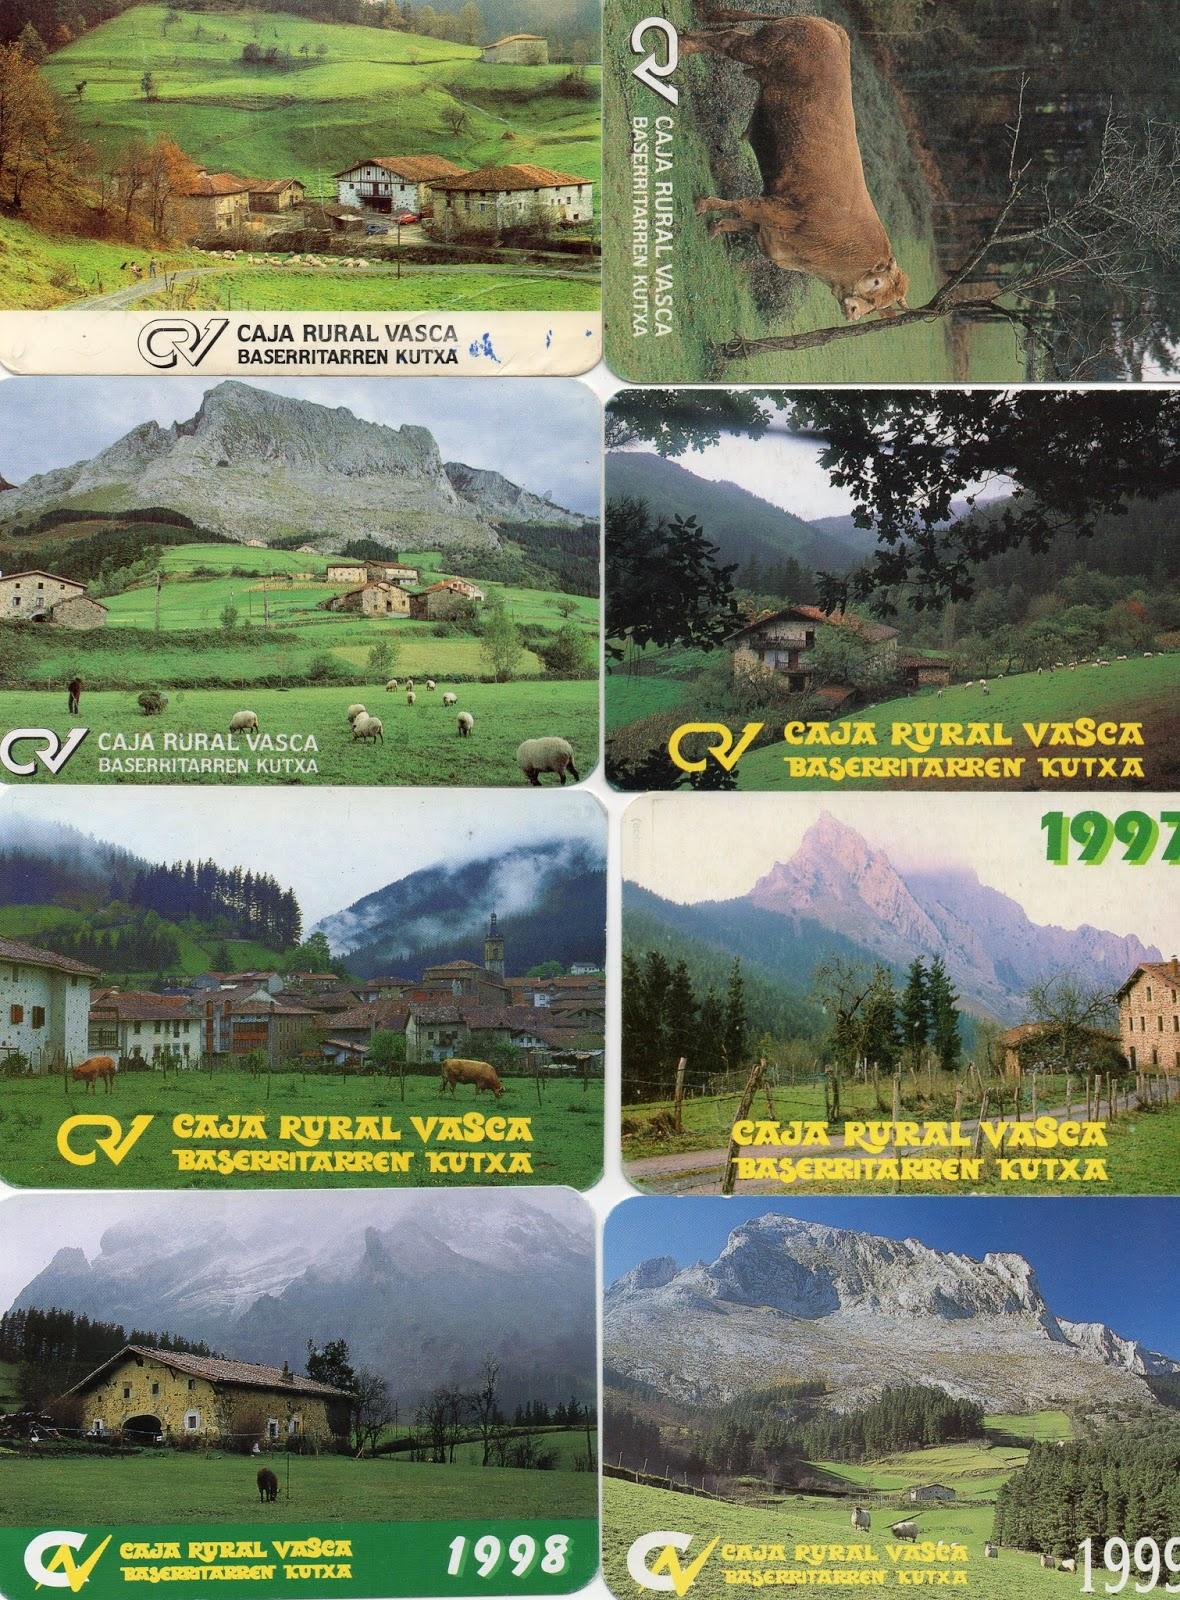 Colecciono calendarios caja rural vasca ipar kutxa 1983 for Kutxa oficinas madrid